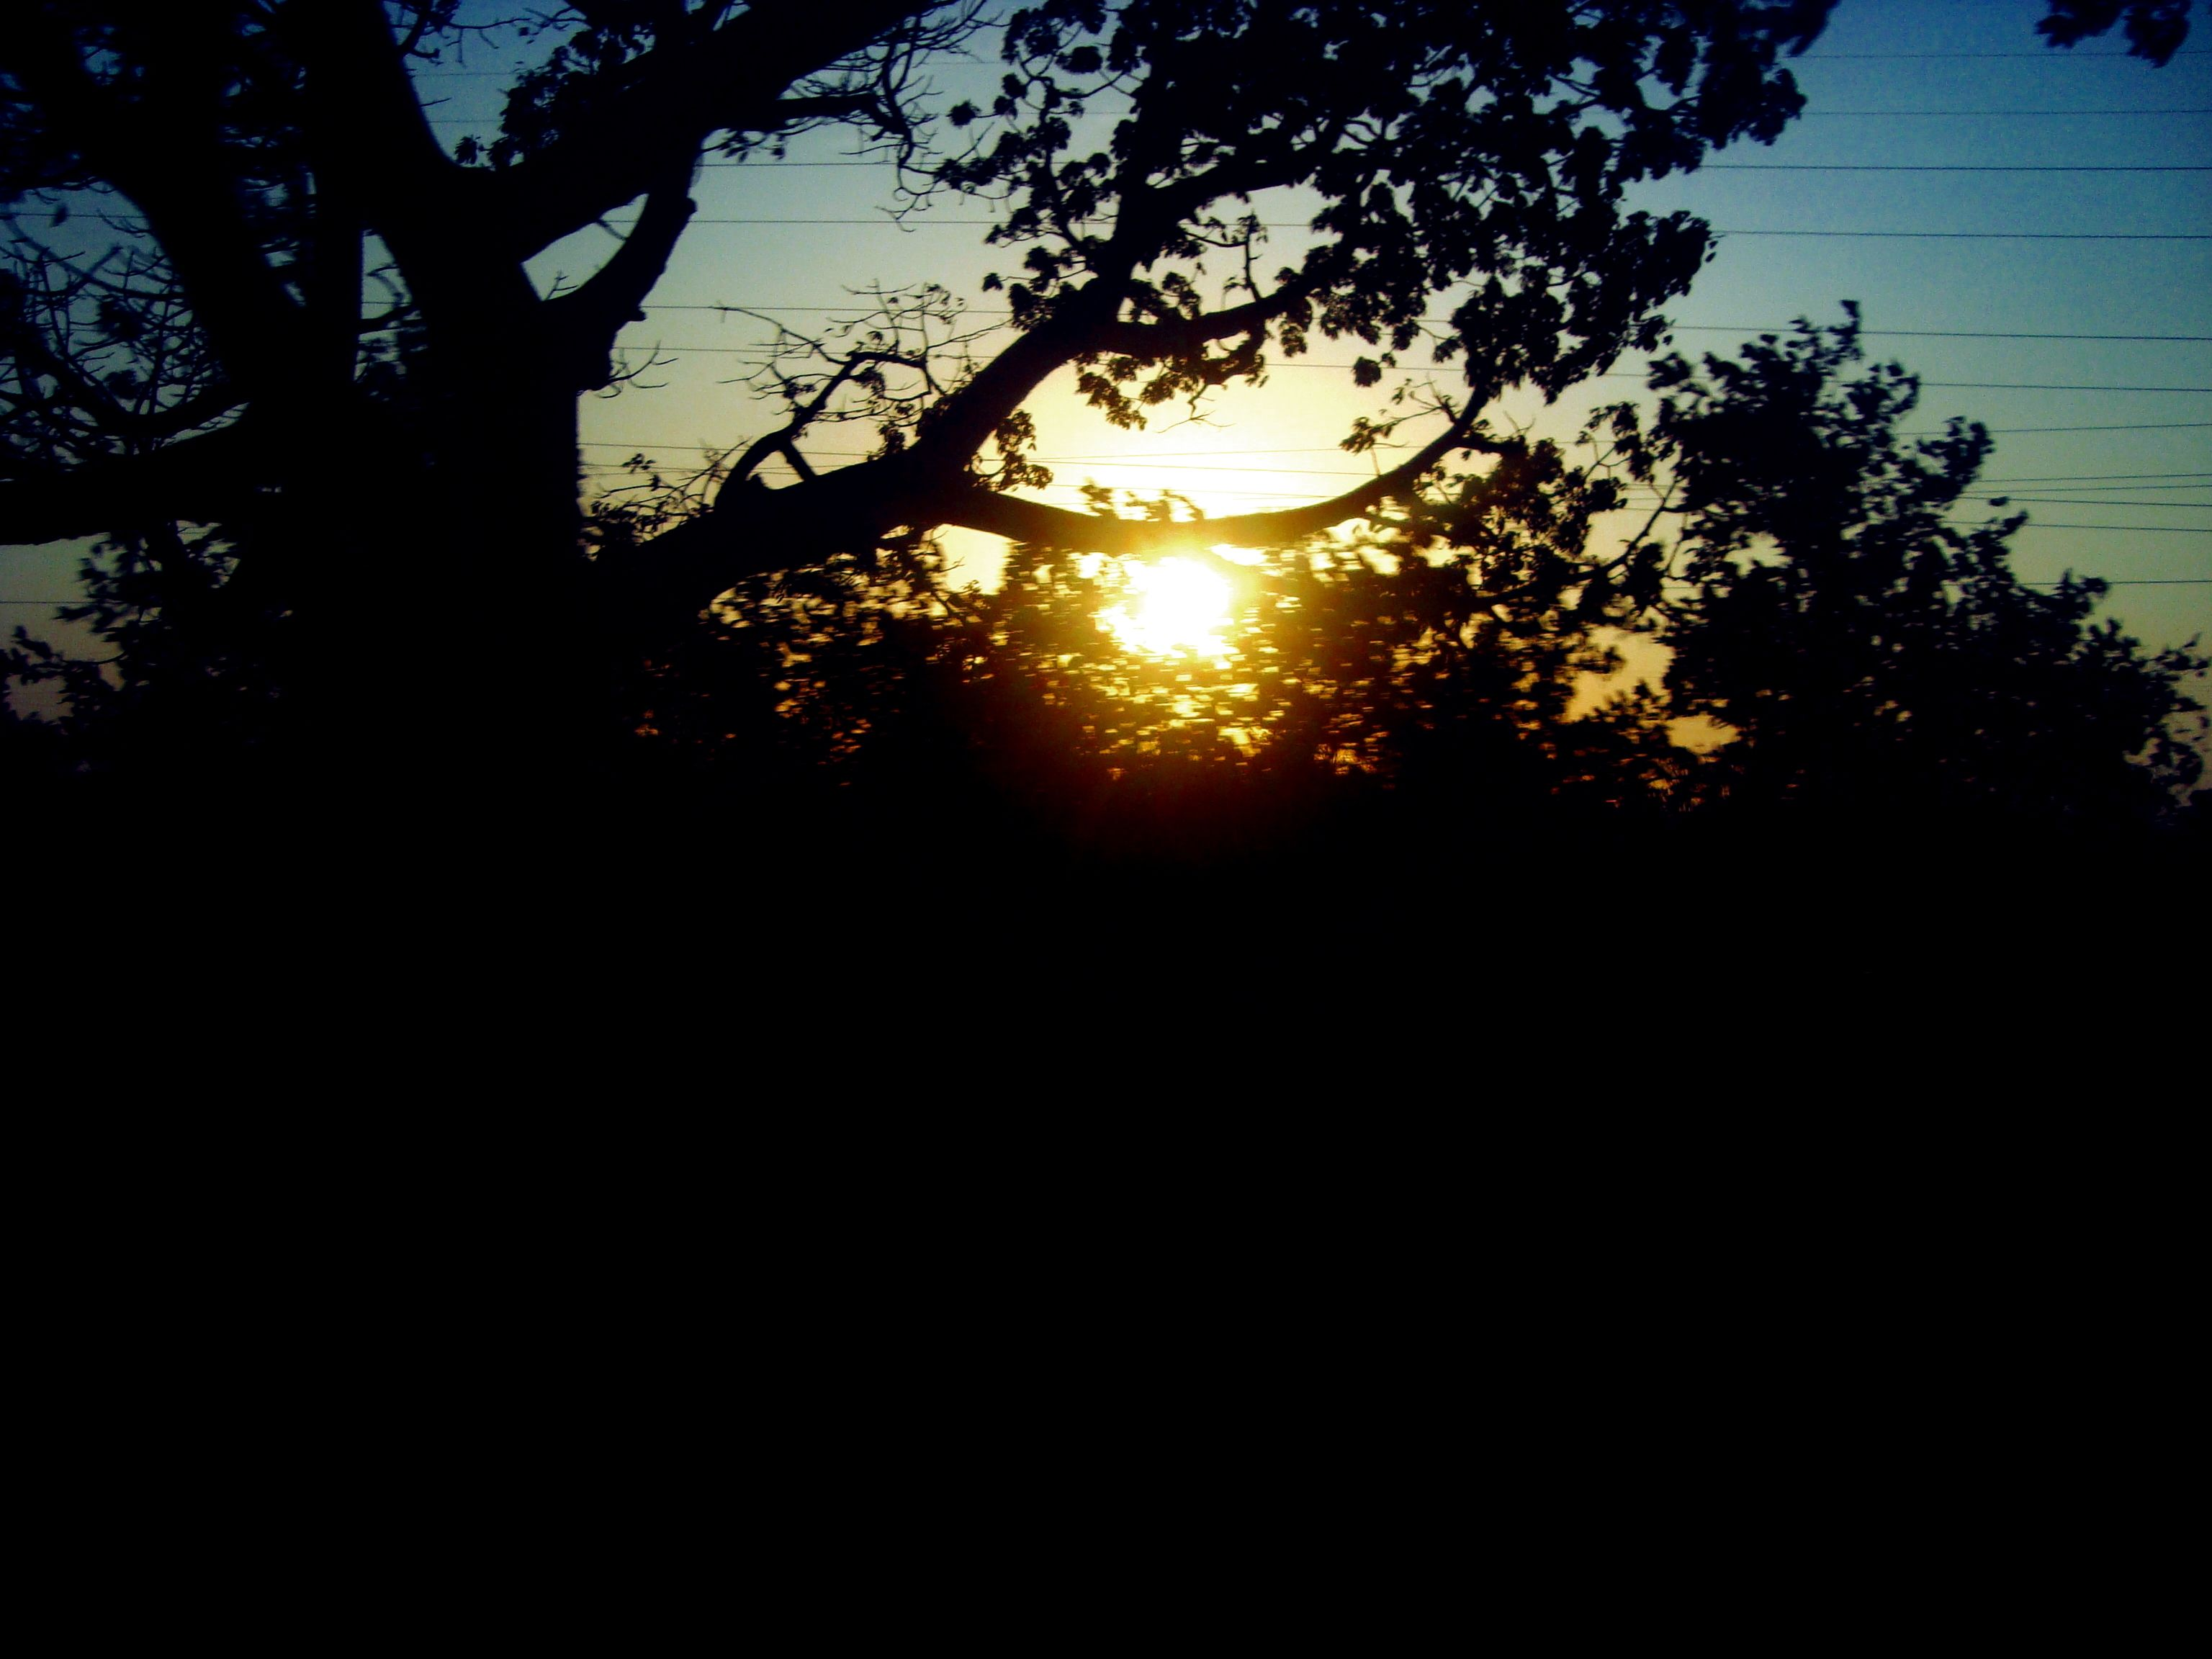 Just another beautiful sun..